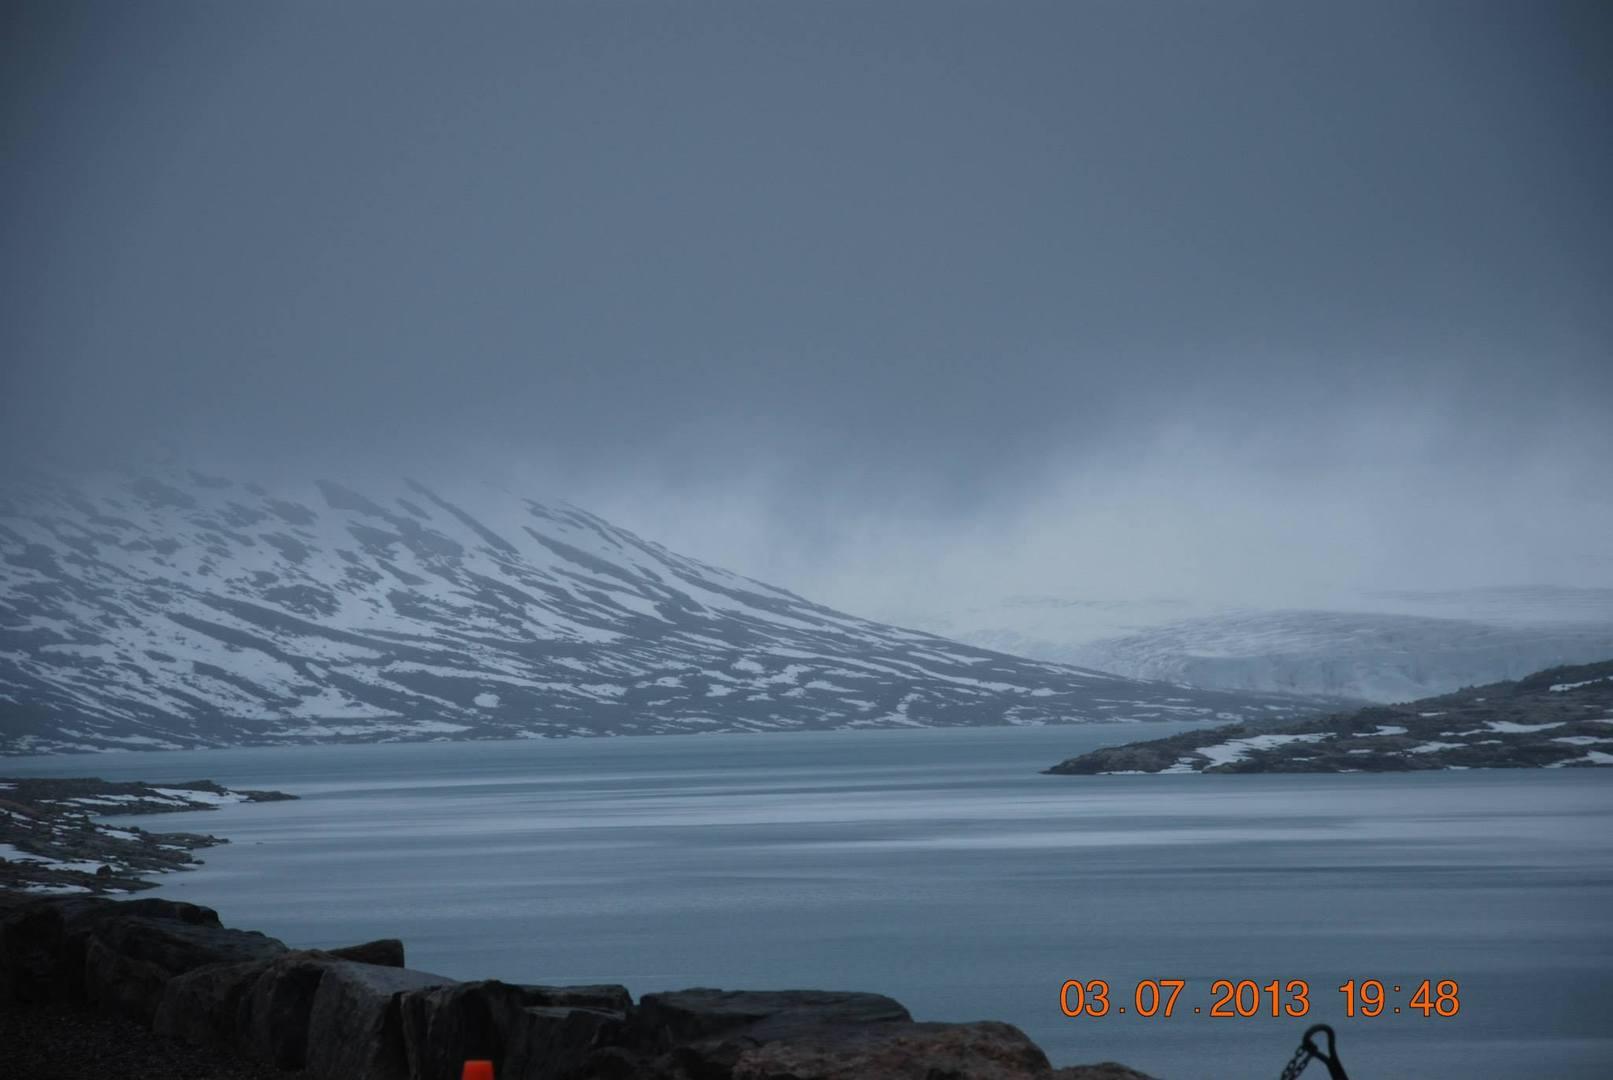 אגם Austdalsvatnet הנושק לקרחון Austdalsbreen